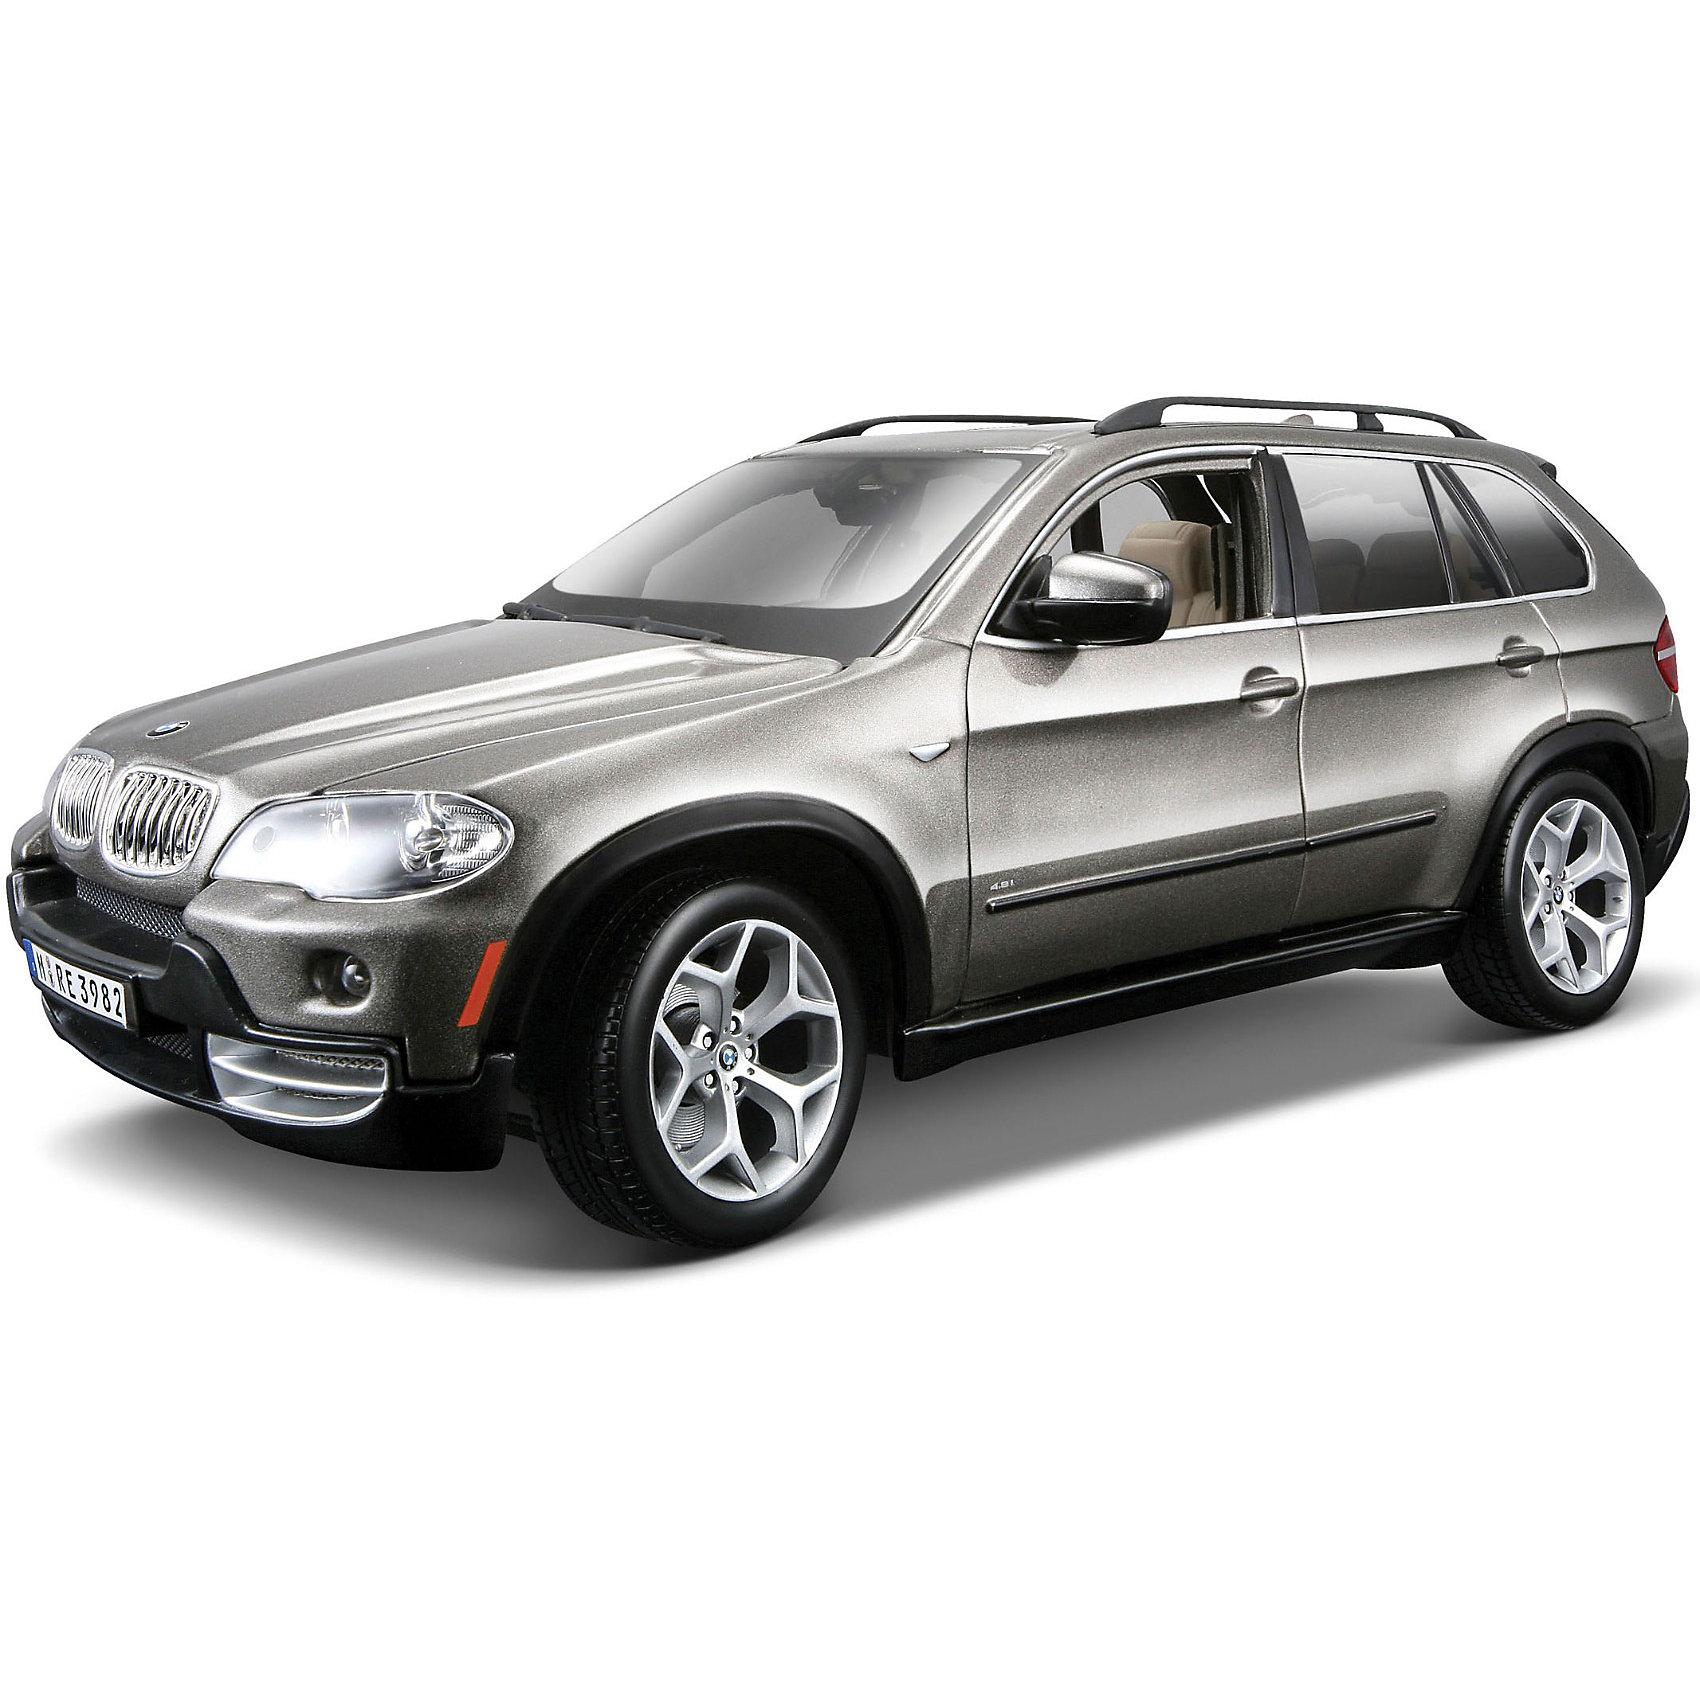 ������ BMW X5 1:18, Bburago